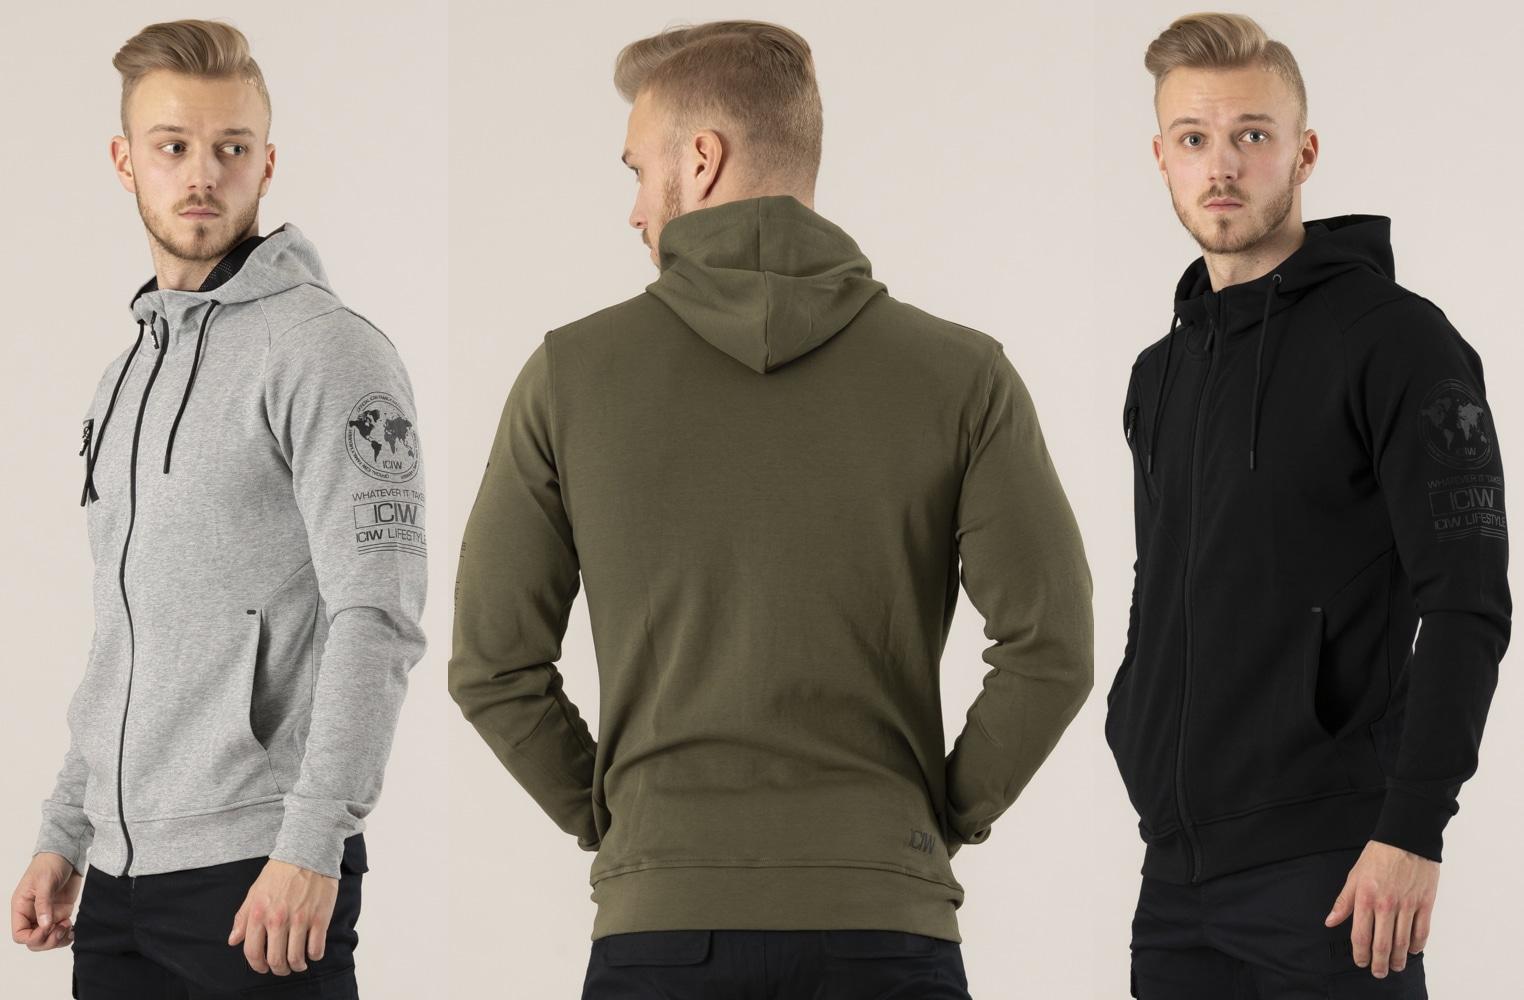 i can i will hoodie herr träning hoodie blixtlås män iciw